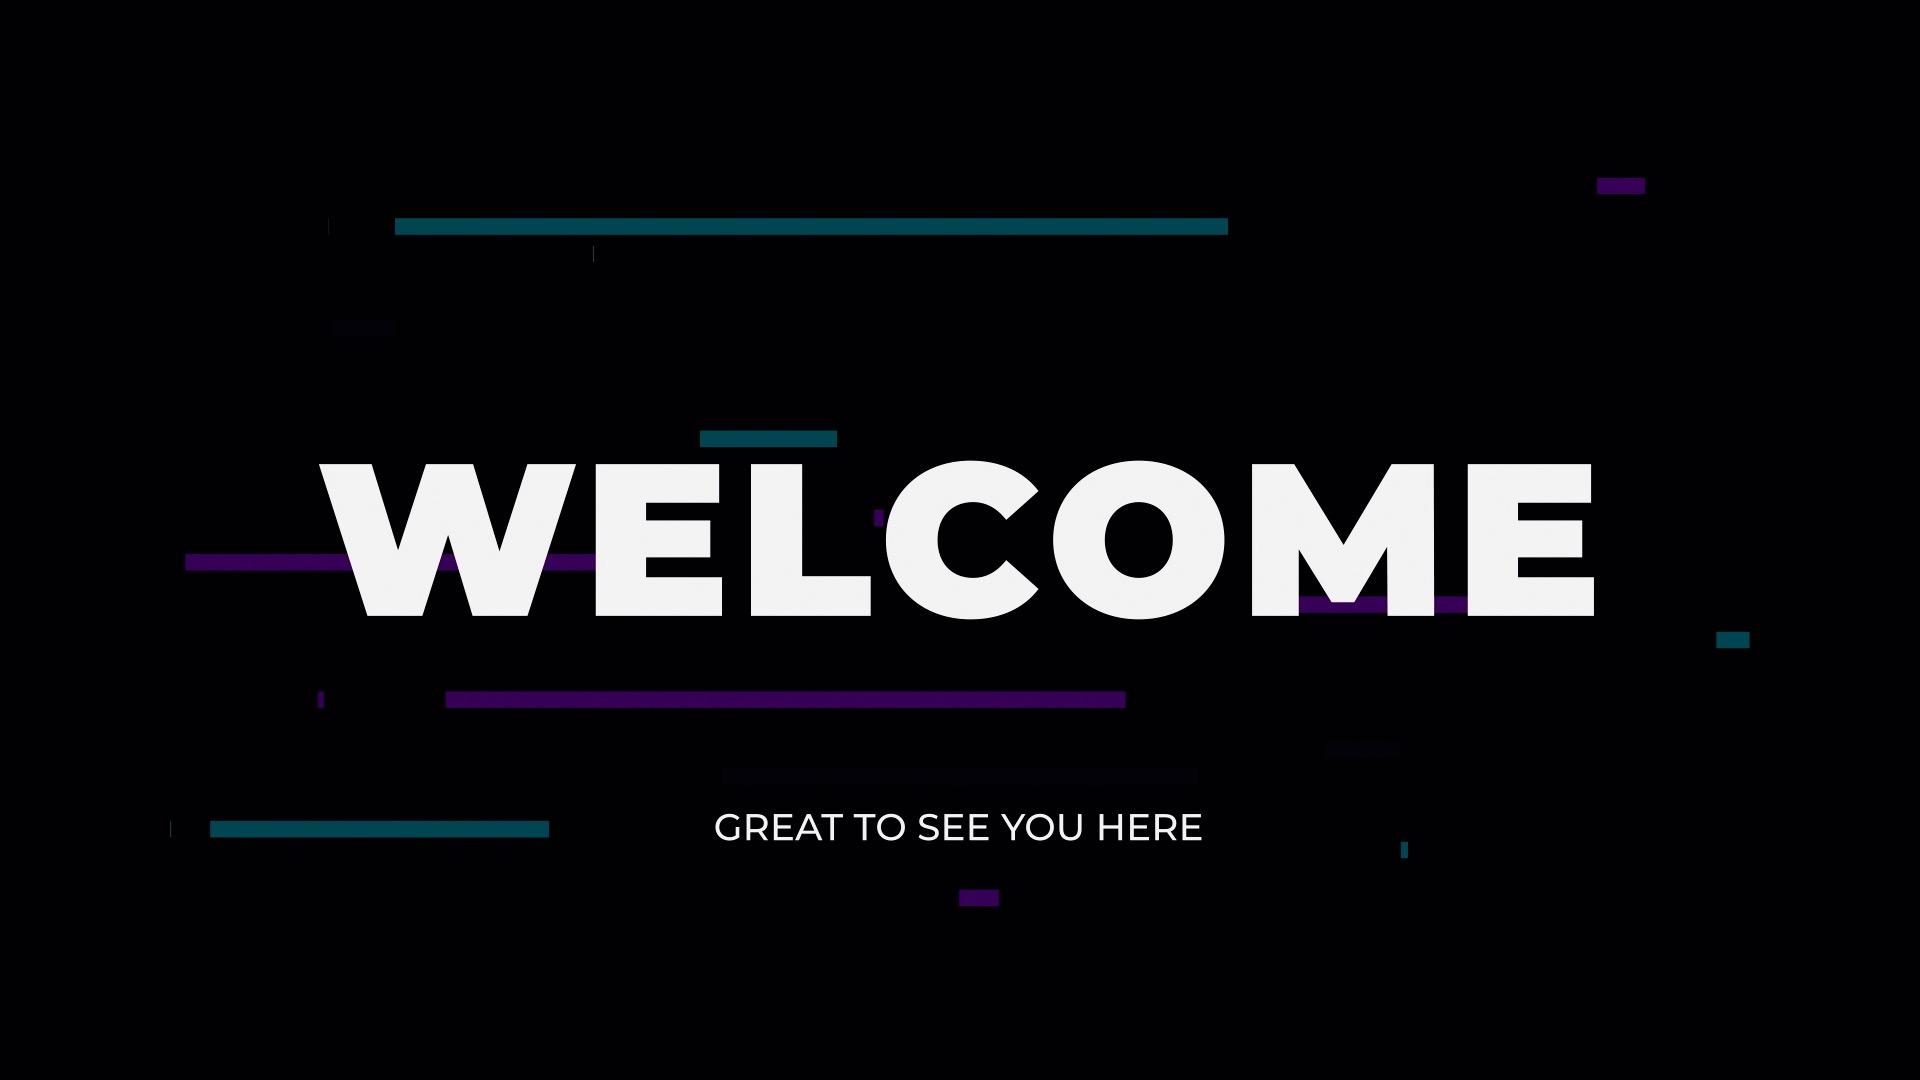 VMC-Welcome-01-Title.jpg